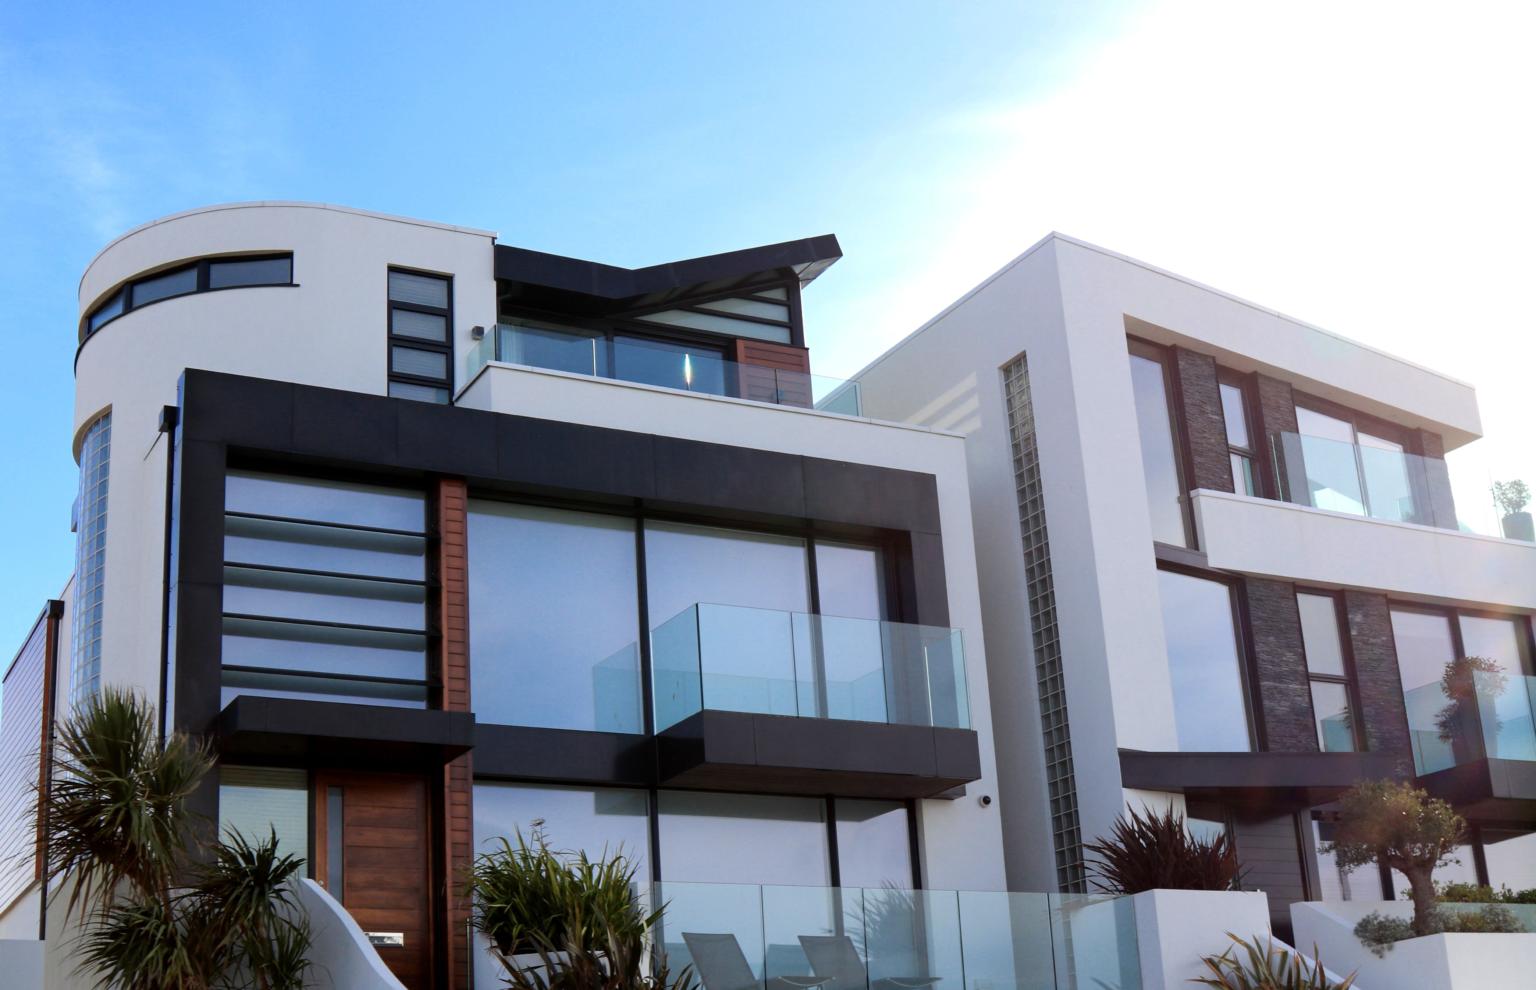 Promotion immobilier diaspora